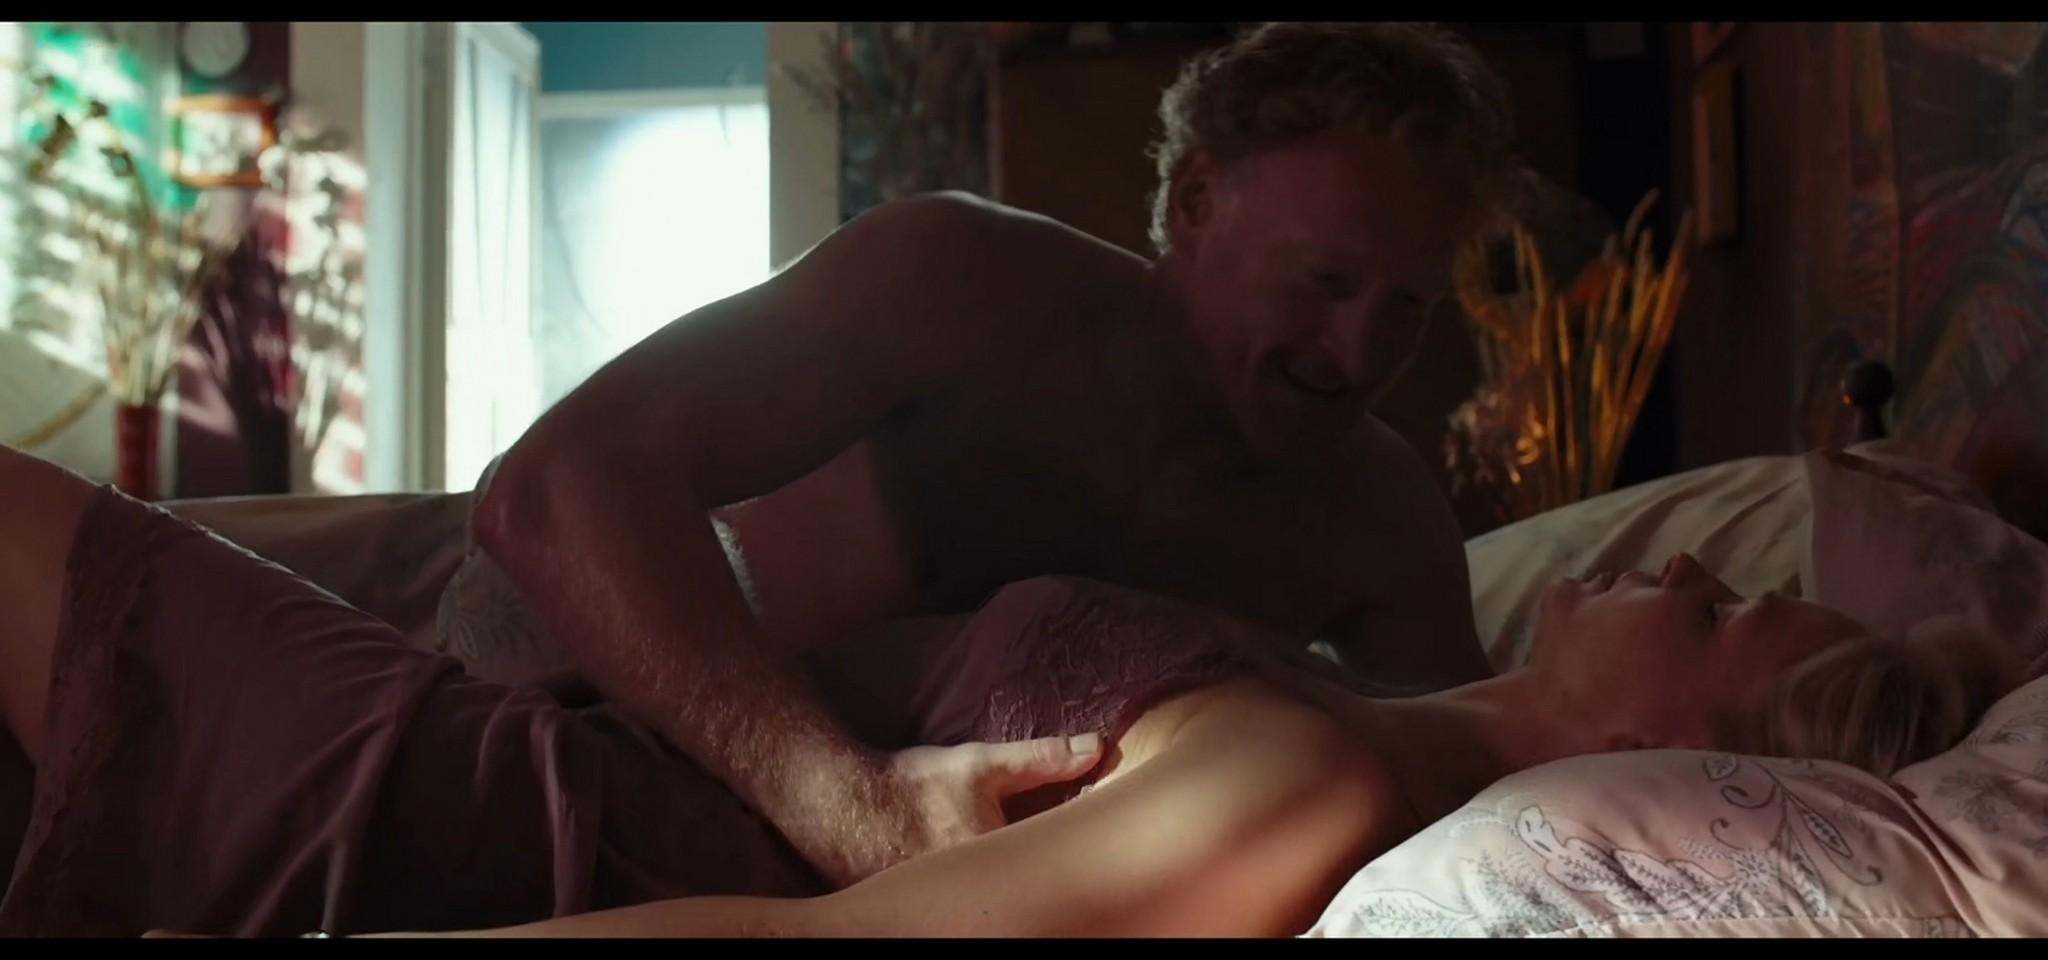 Yulia Snigir hot and some sex Anna Chipovskaya, Yuliya Peresild sexy - The End of the Season (2019) HD 1080p Web (13)